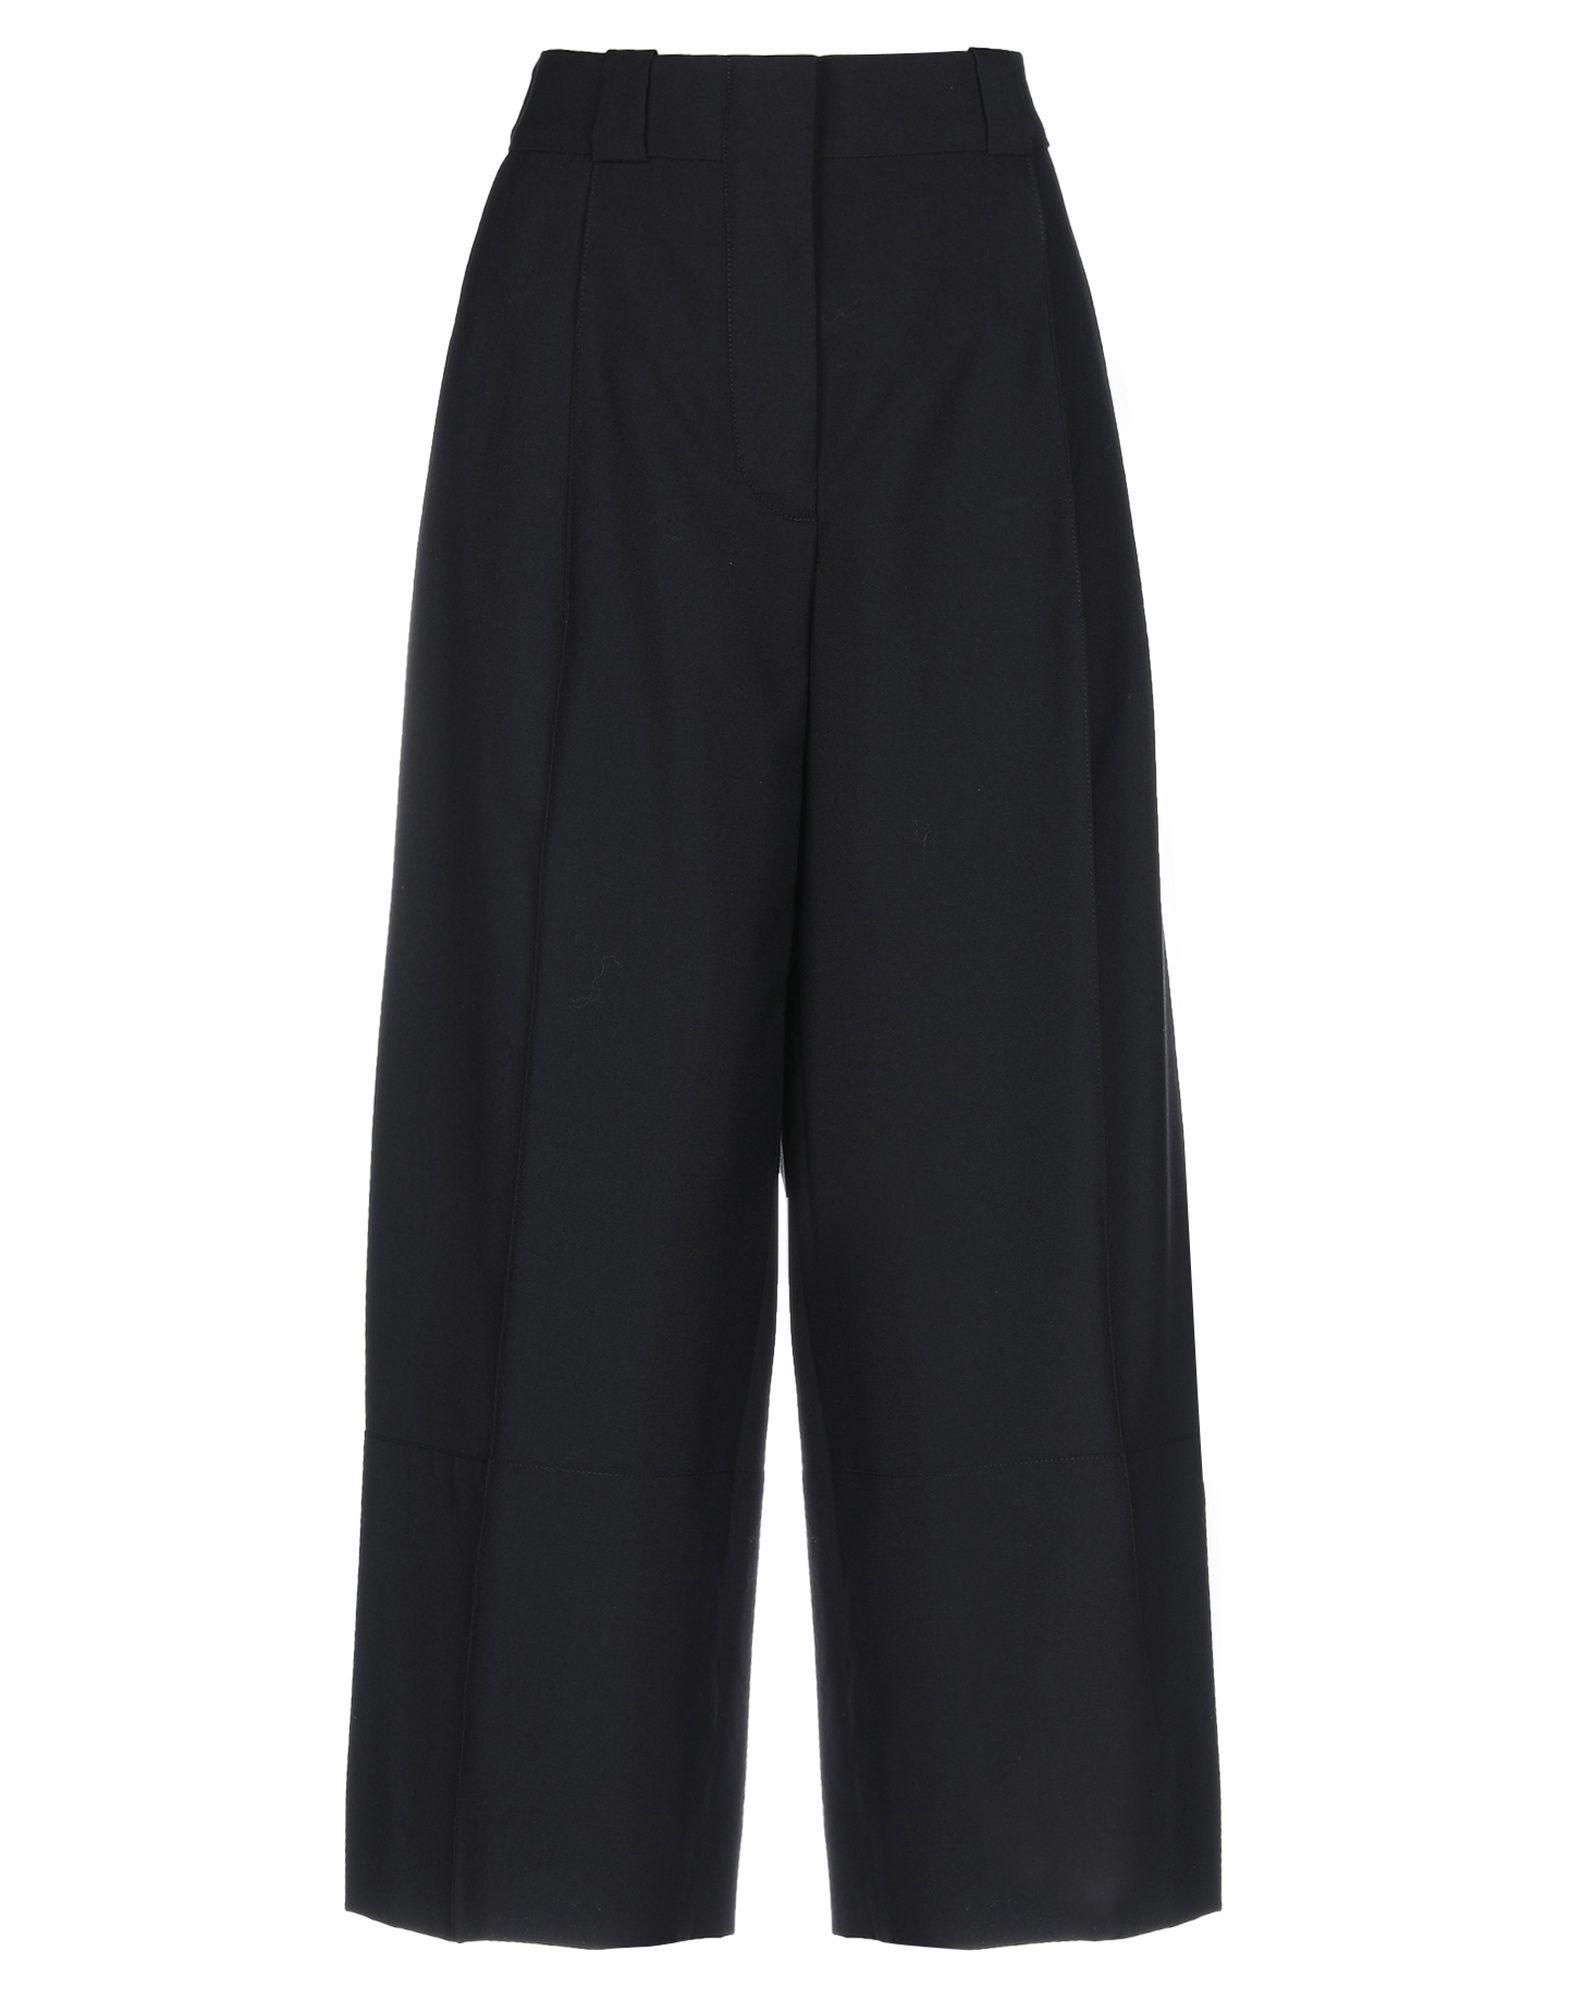 Pantalone Pantalone Marni donna - 13325674PS